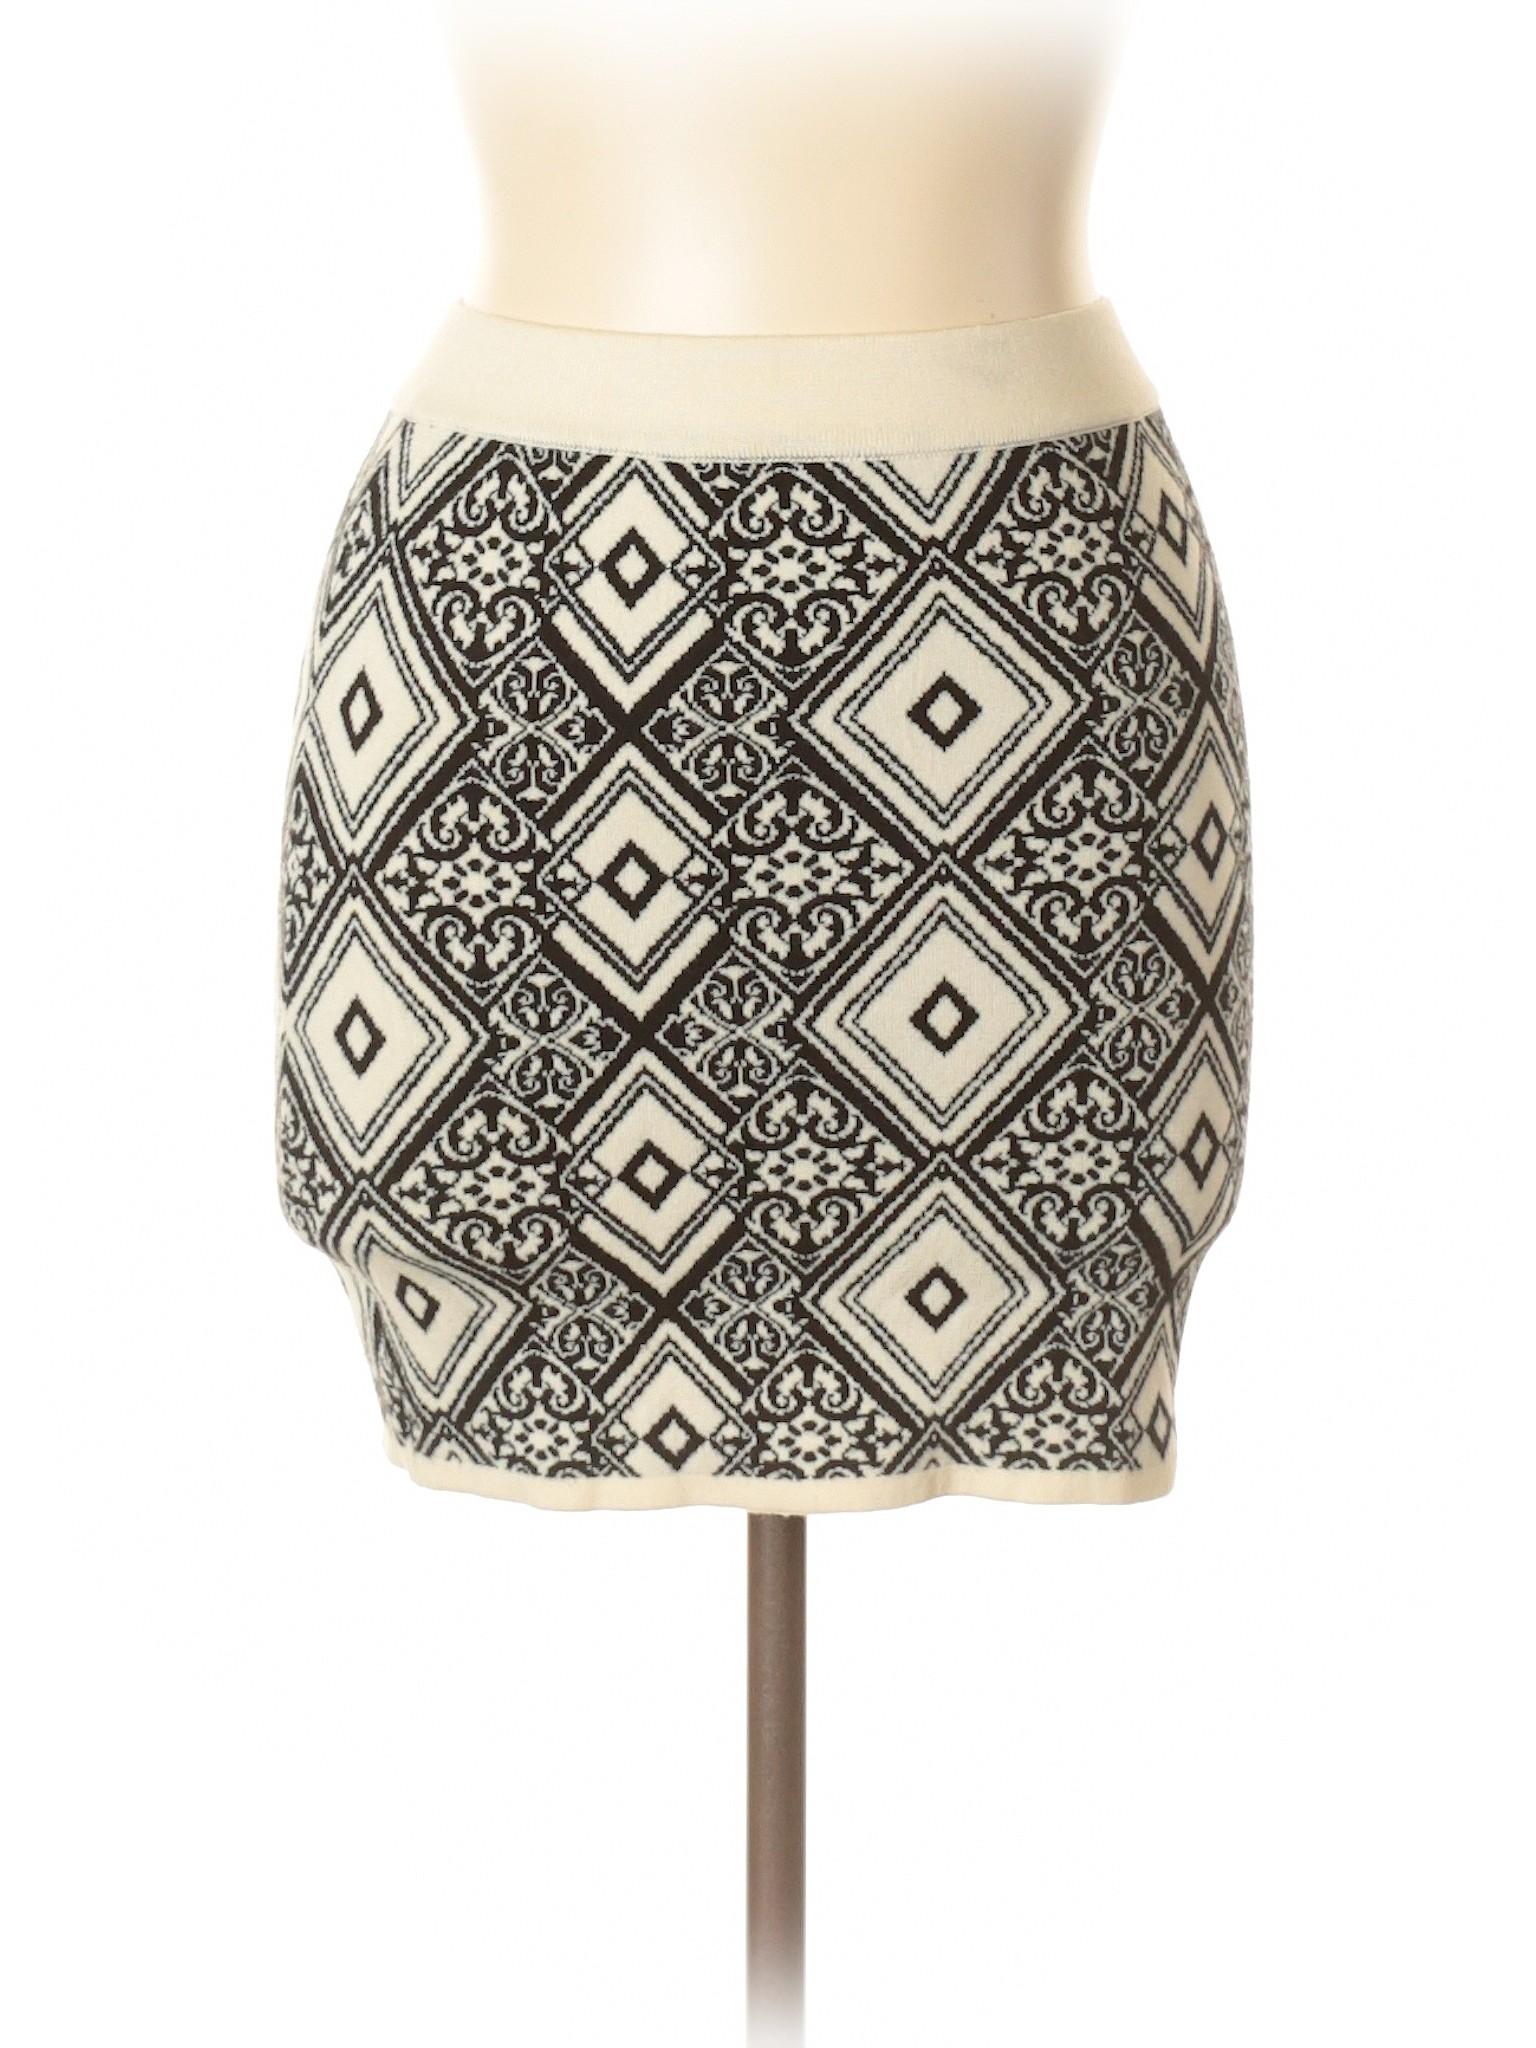 Casual Casual Boutique Casual Casual Boutique Skirt Skirt Casual Boutique Boutique Boutique Skirt Skirt Skirt Boutique OTwFxqE4E